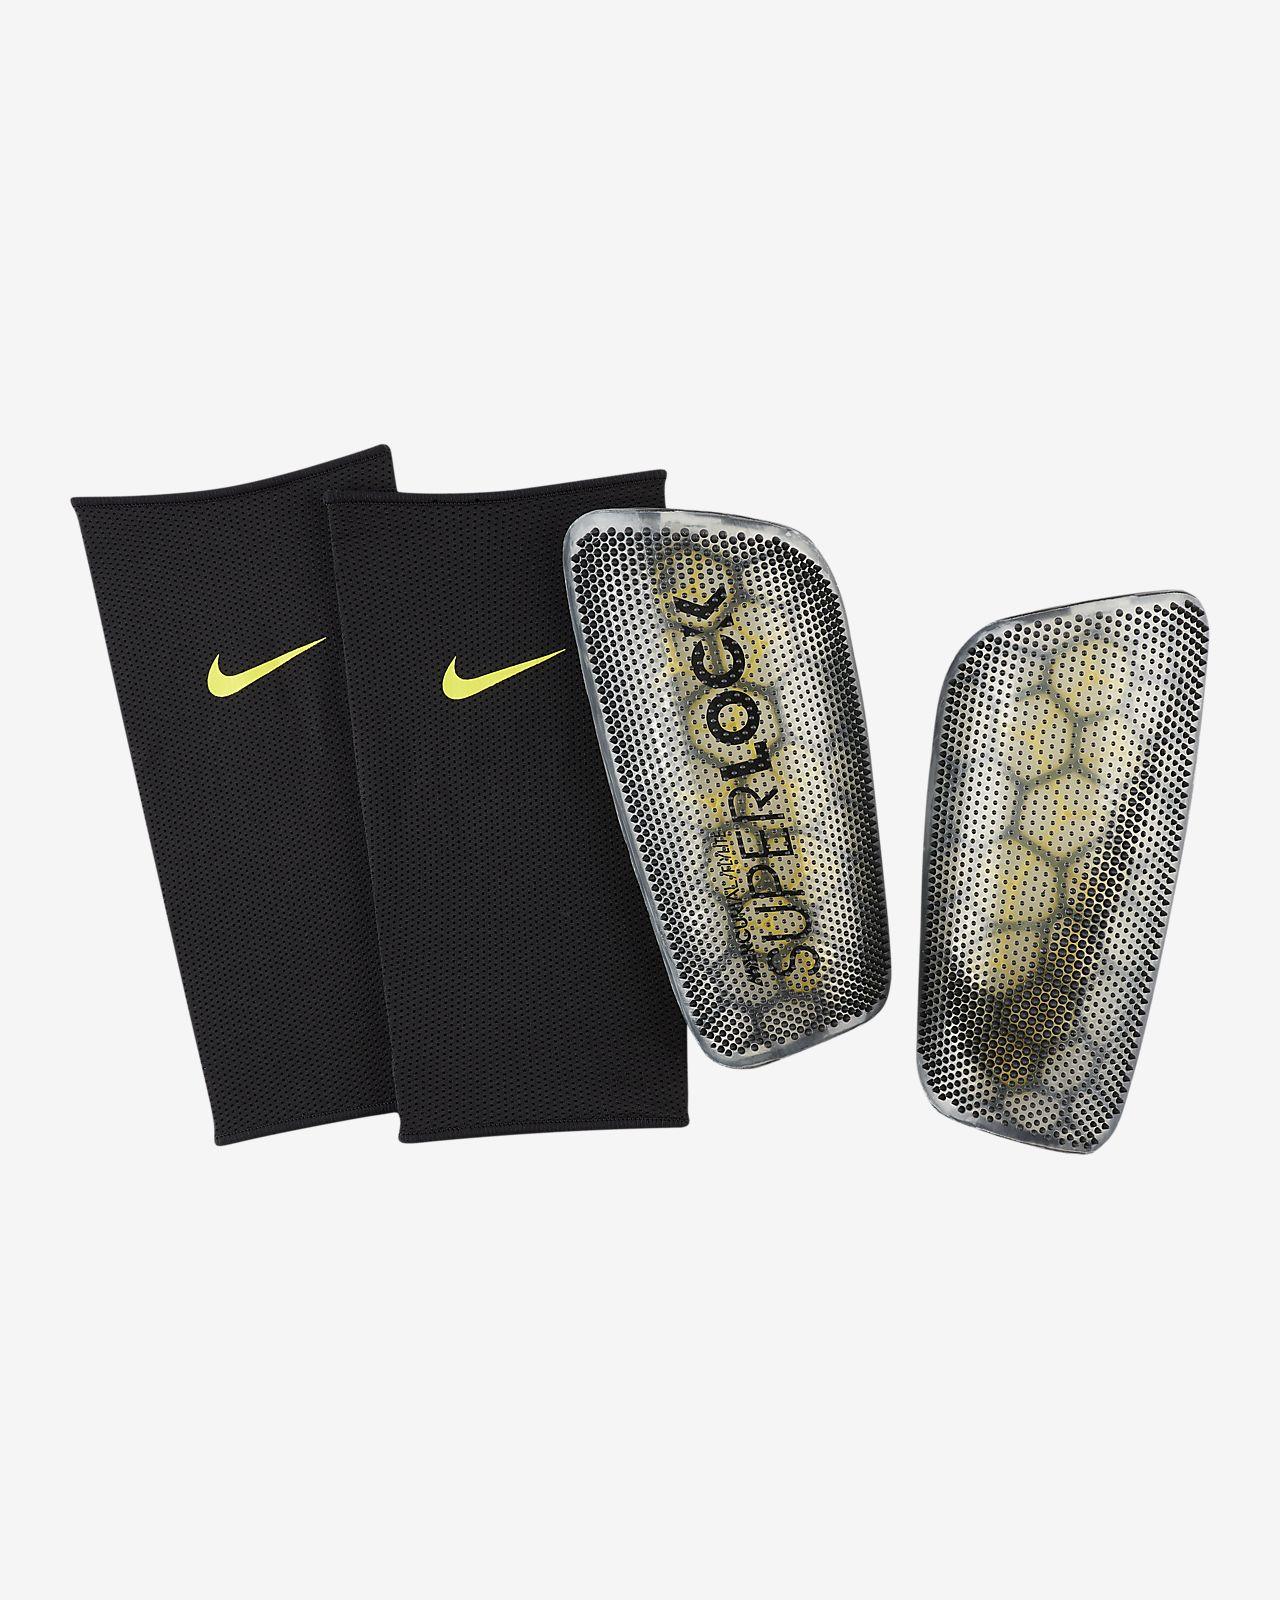 Protège-tibias Nike Mercurial FlyLite SuperLock